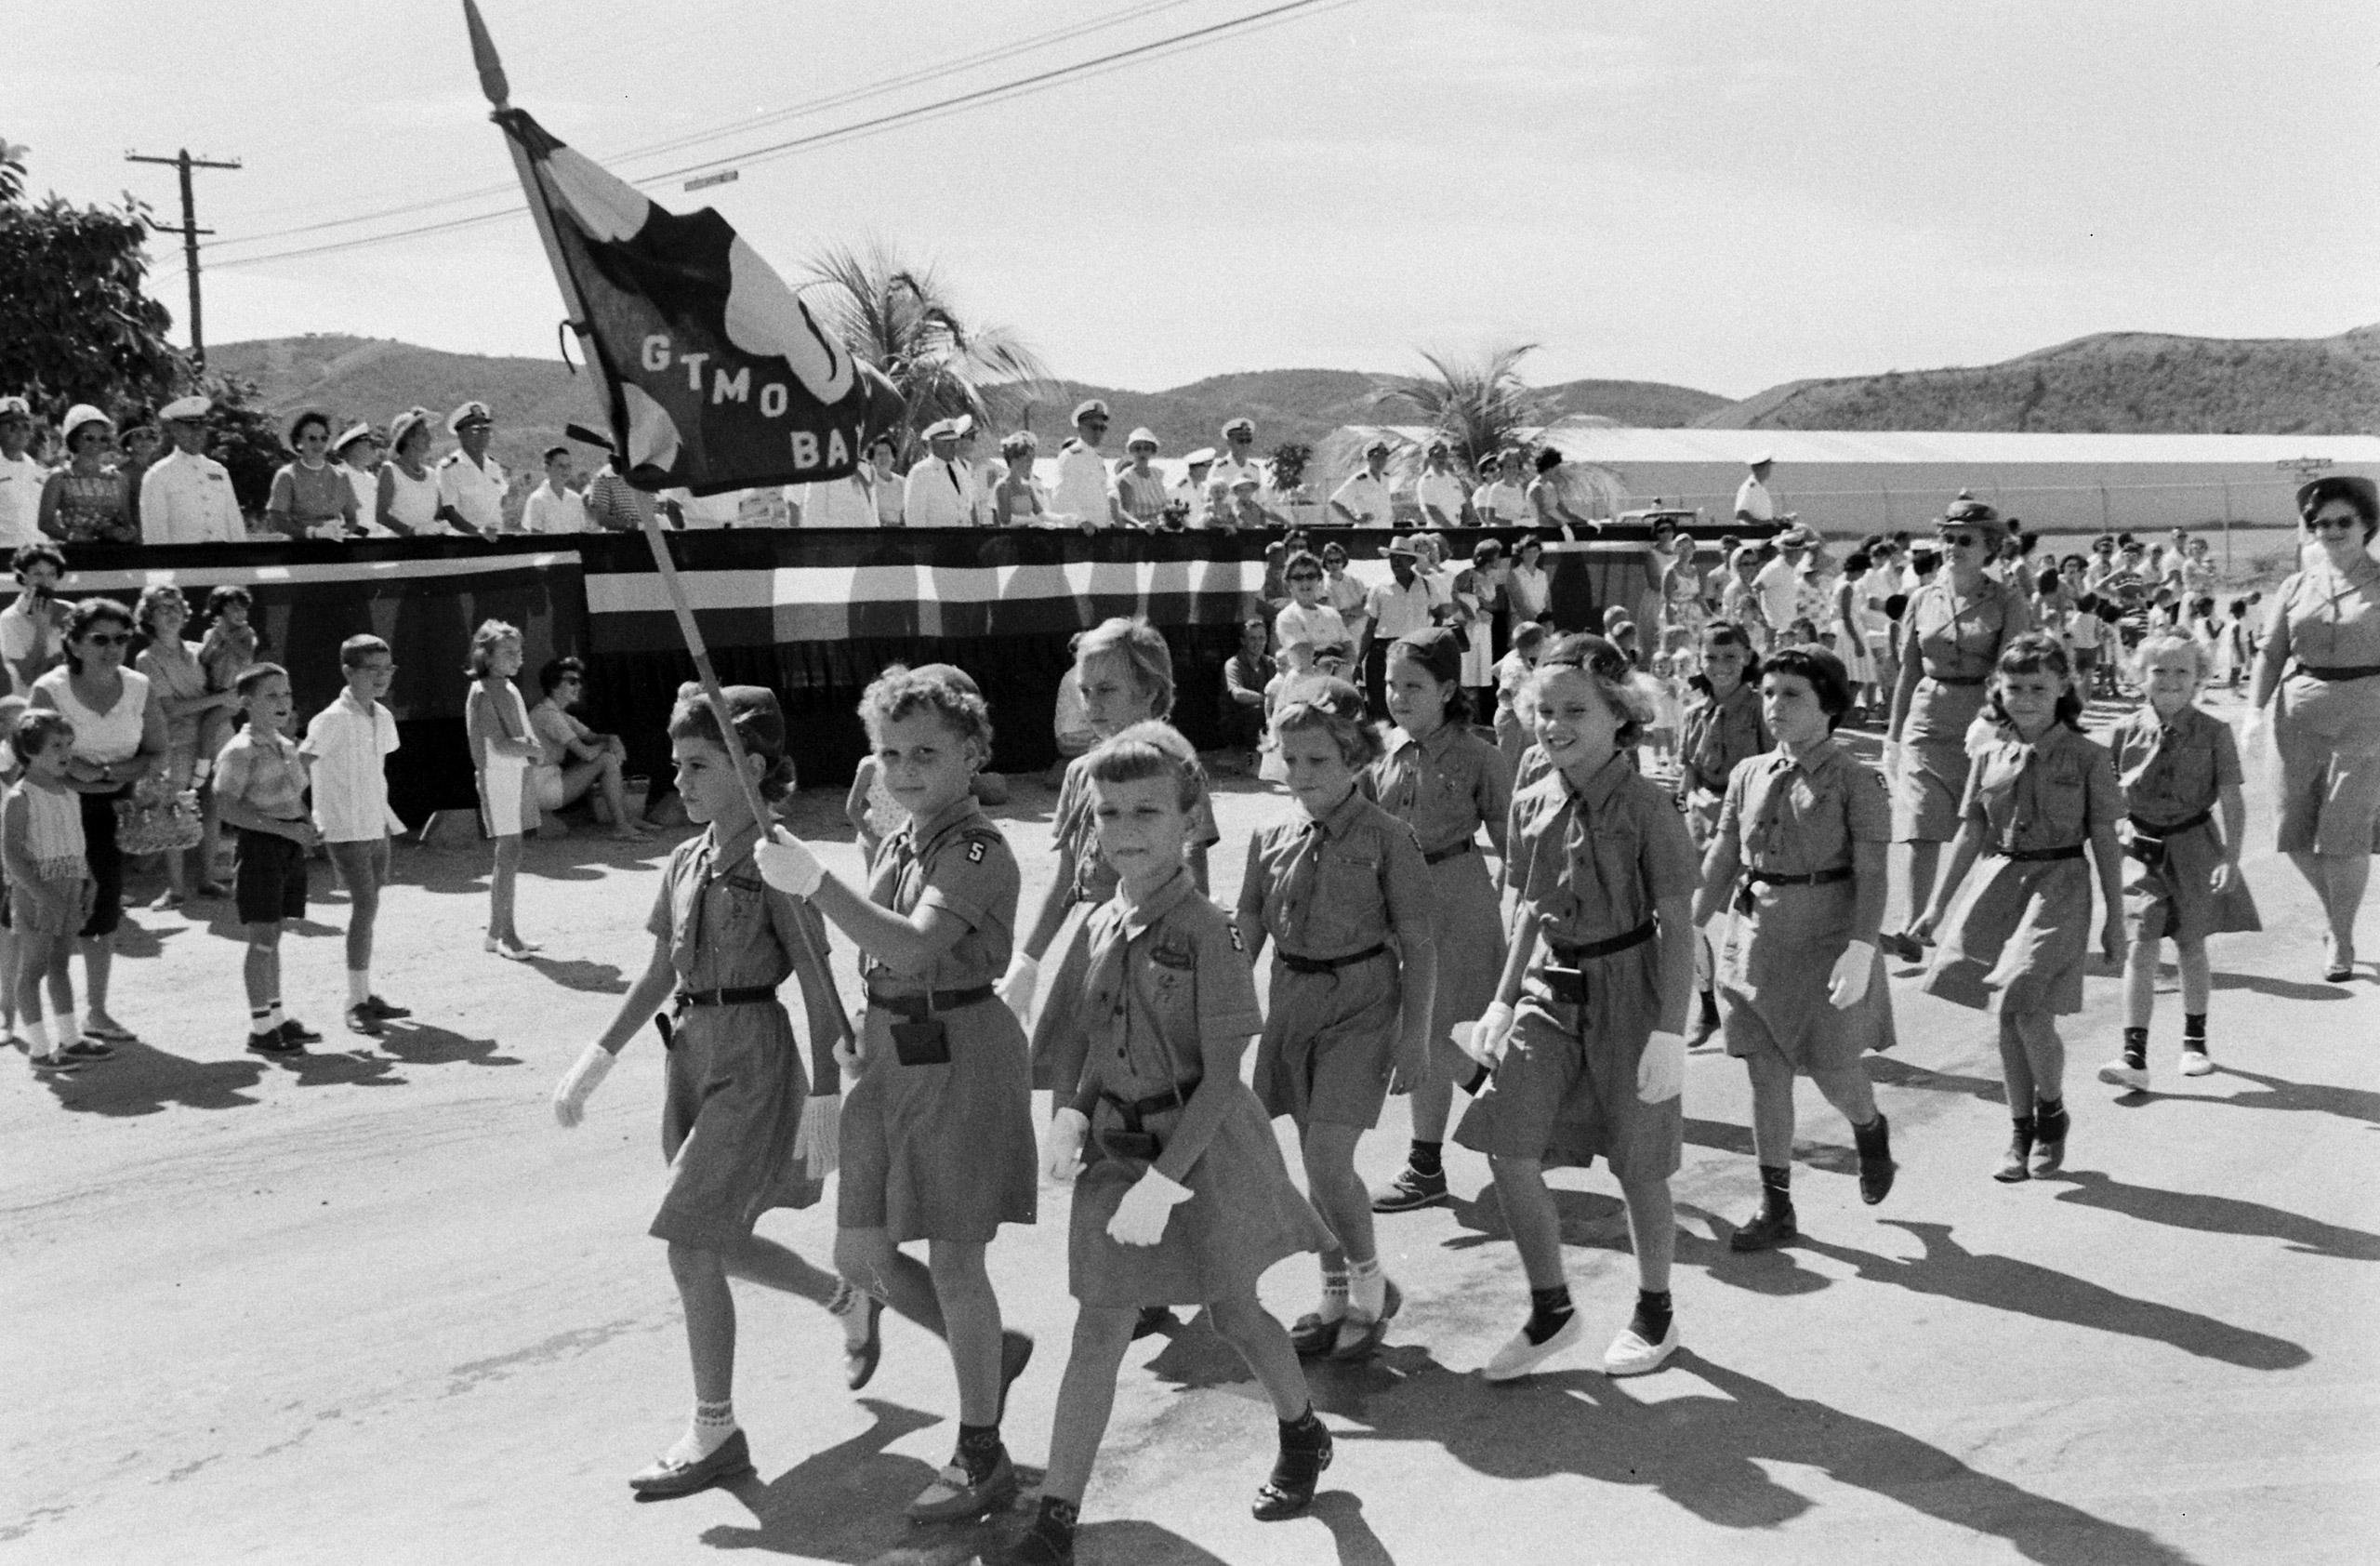 Children's parade, Guantanamo Bay, Cuba, 1962.